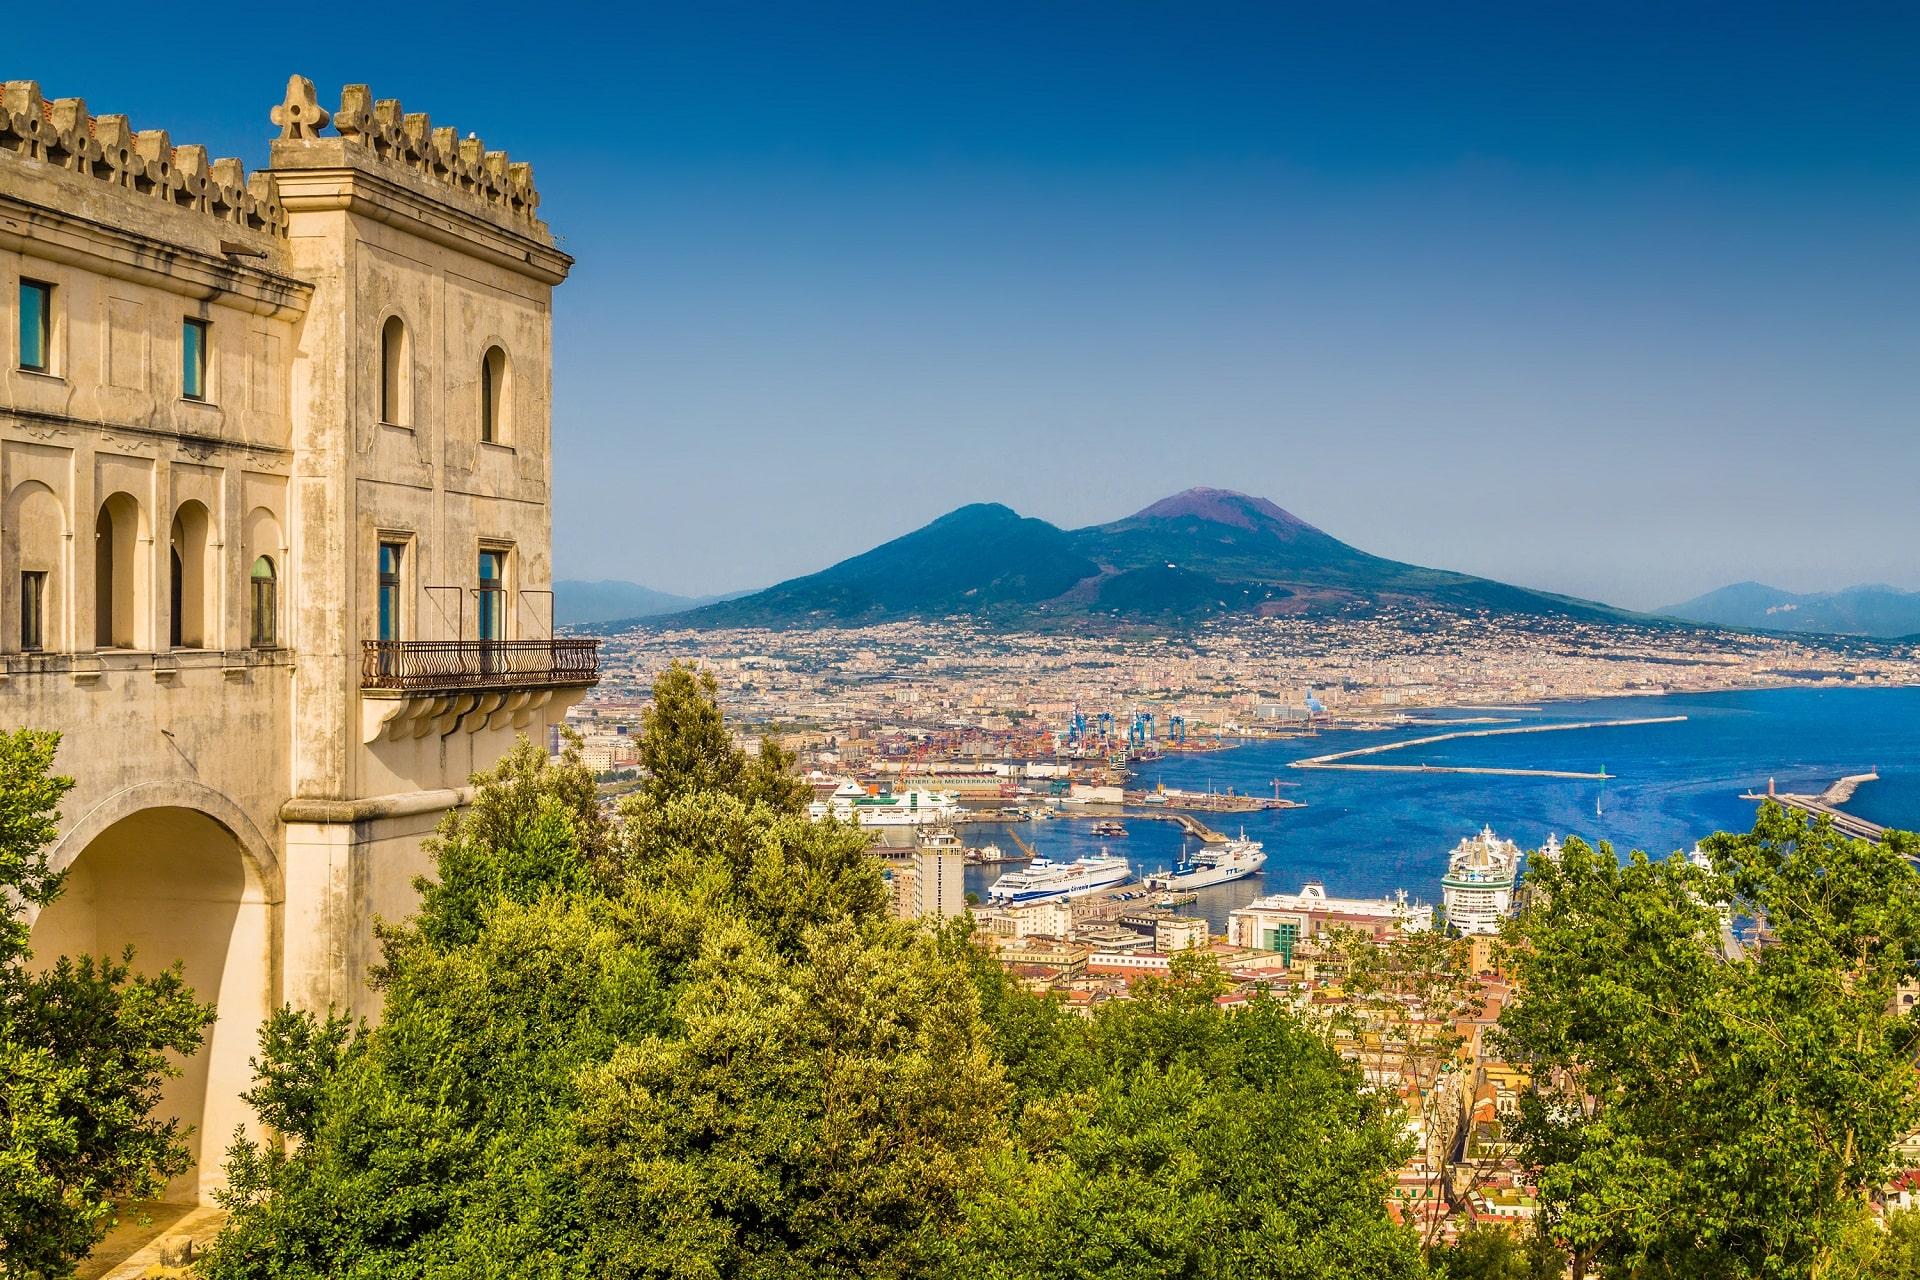 Naples-Mt-Vesuvius-Italy